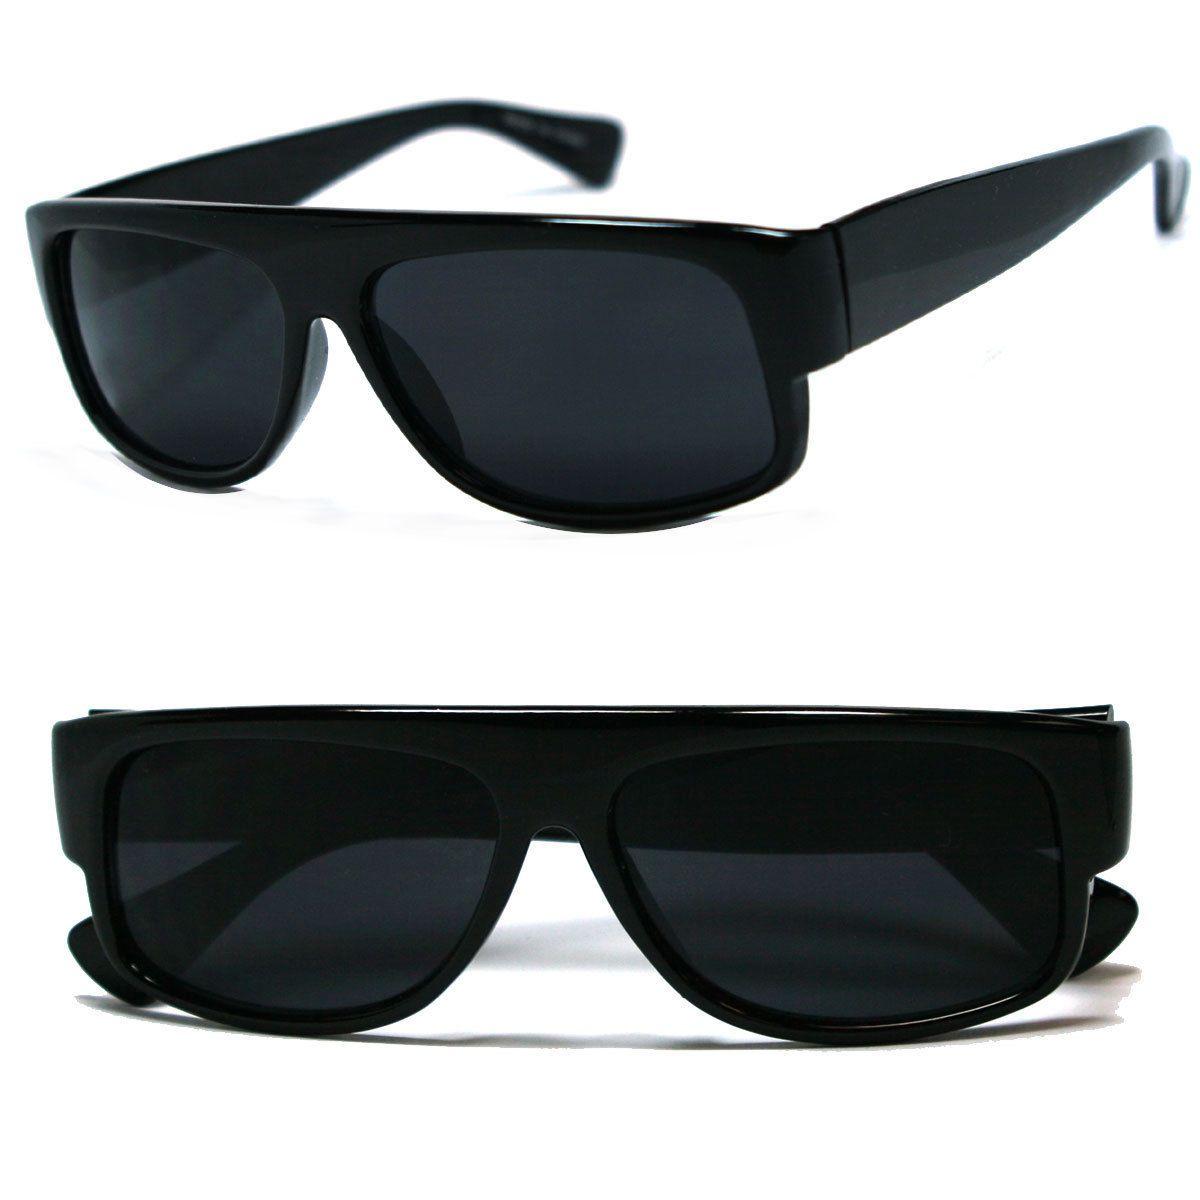 LOCS Slim Gangster Men Shades Designer BLACK Cholo Biker Dark Lens Sunglasses